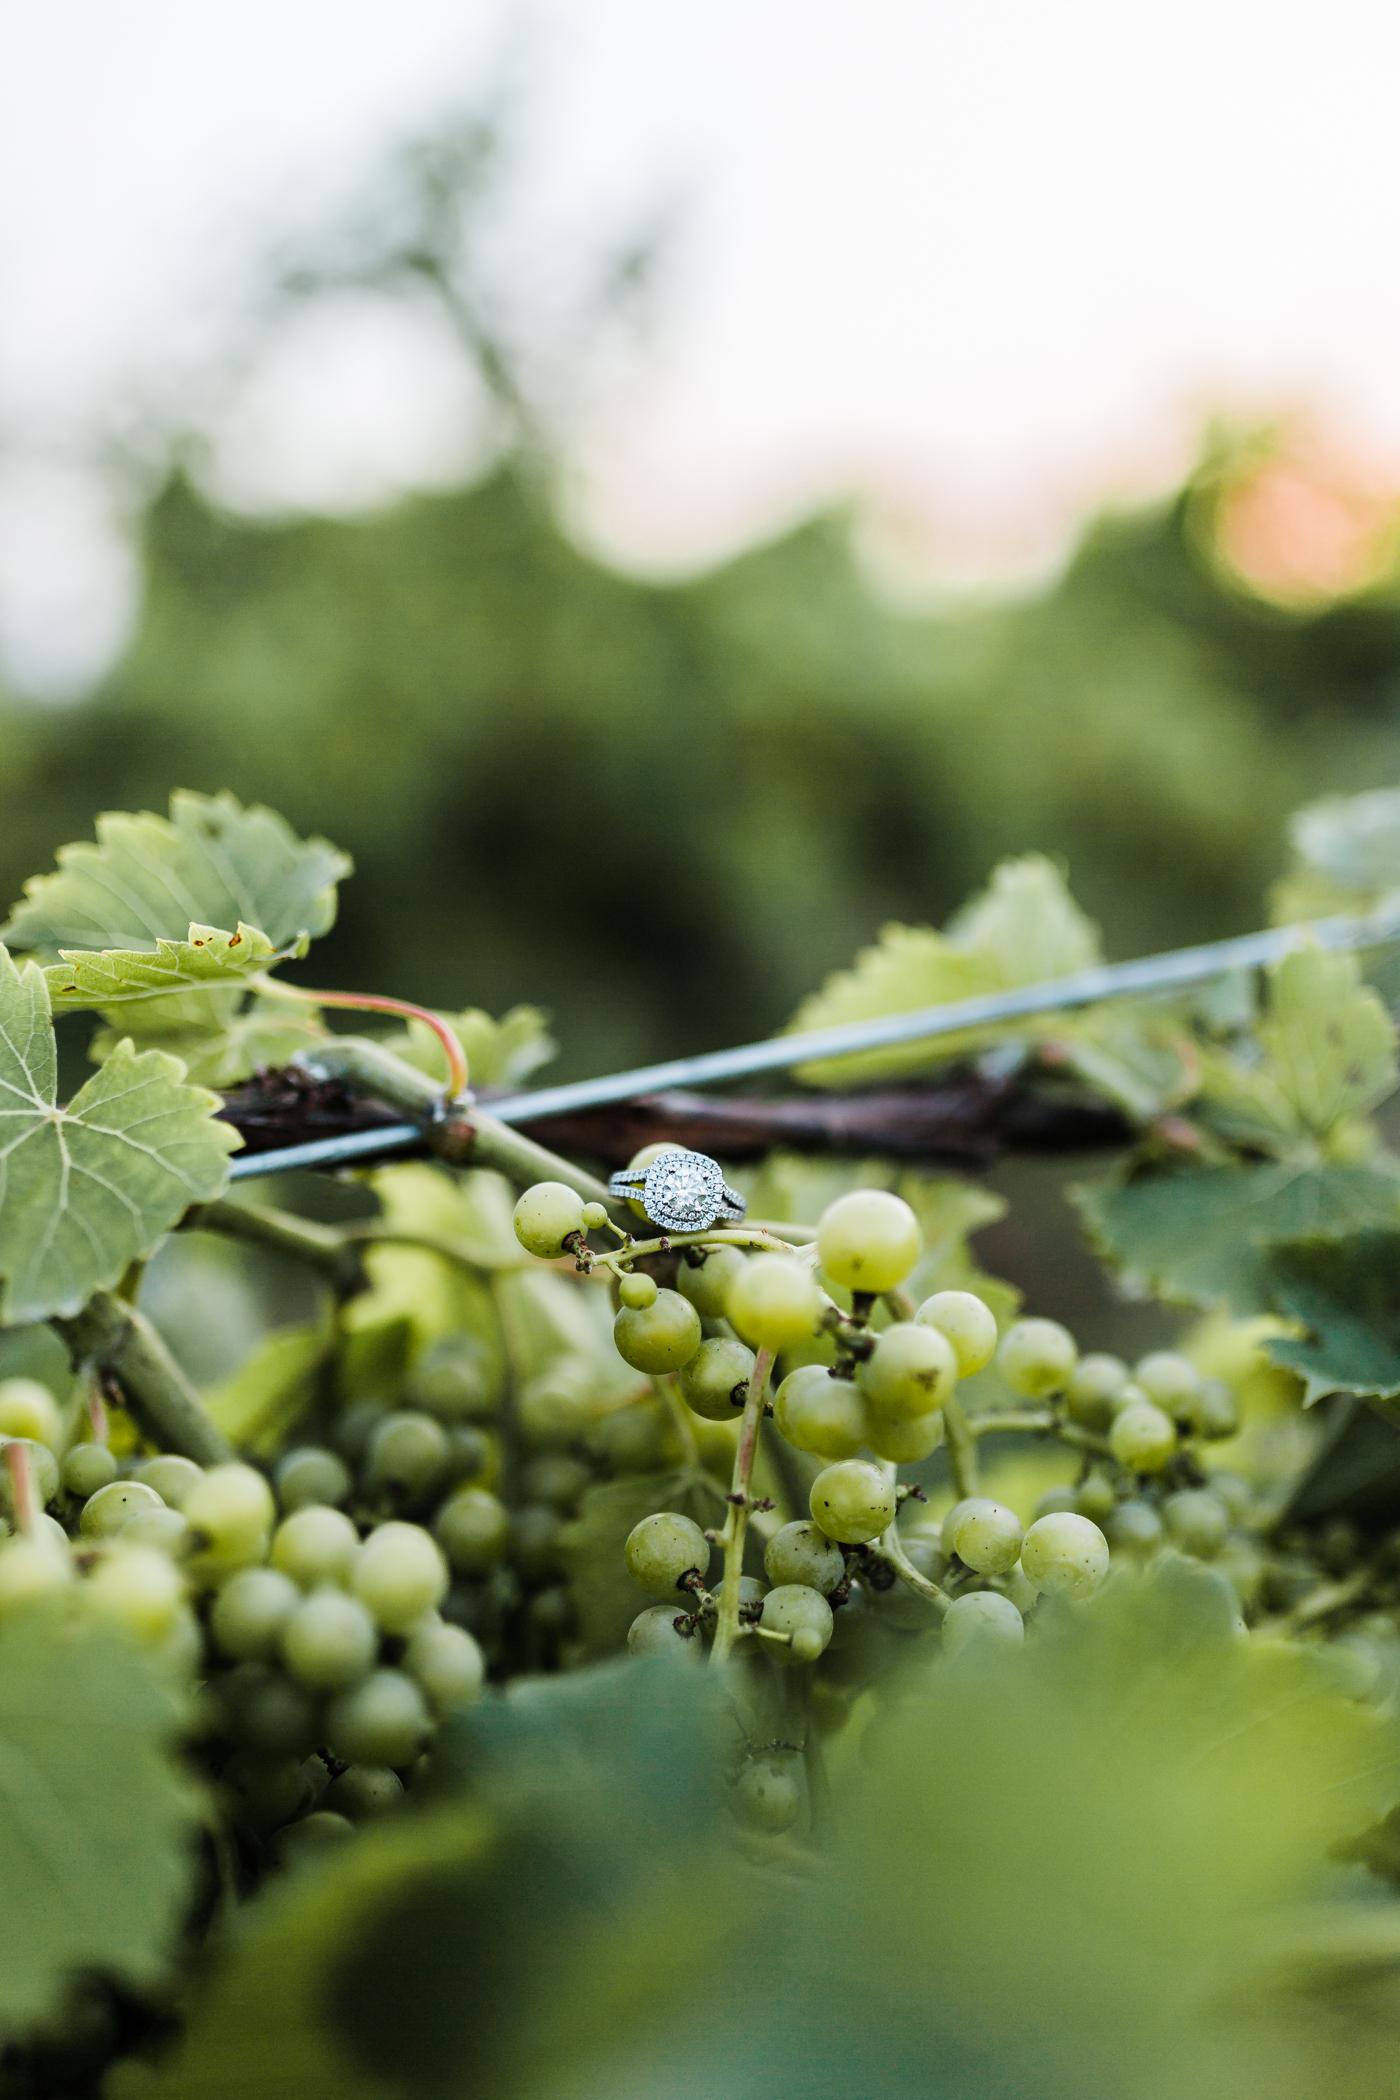 engagement ring shot on vineyard vines and grapes - pennsylvania